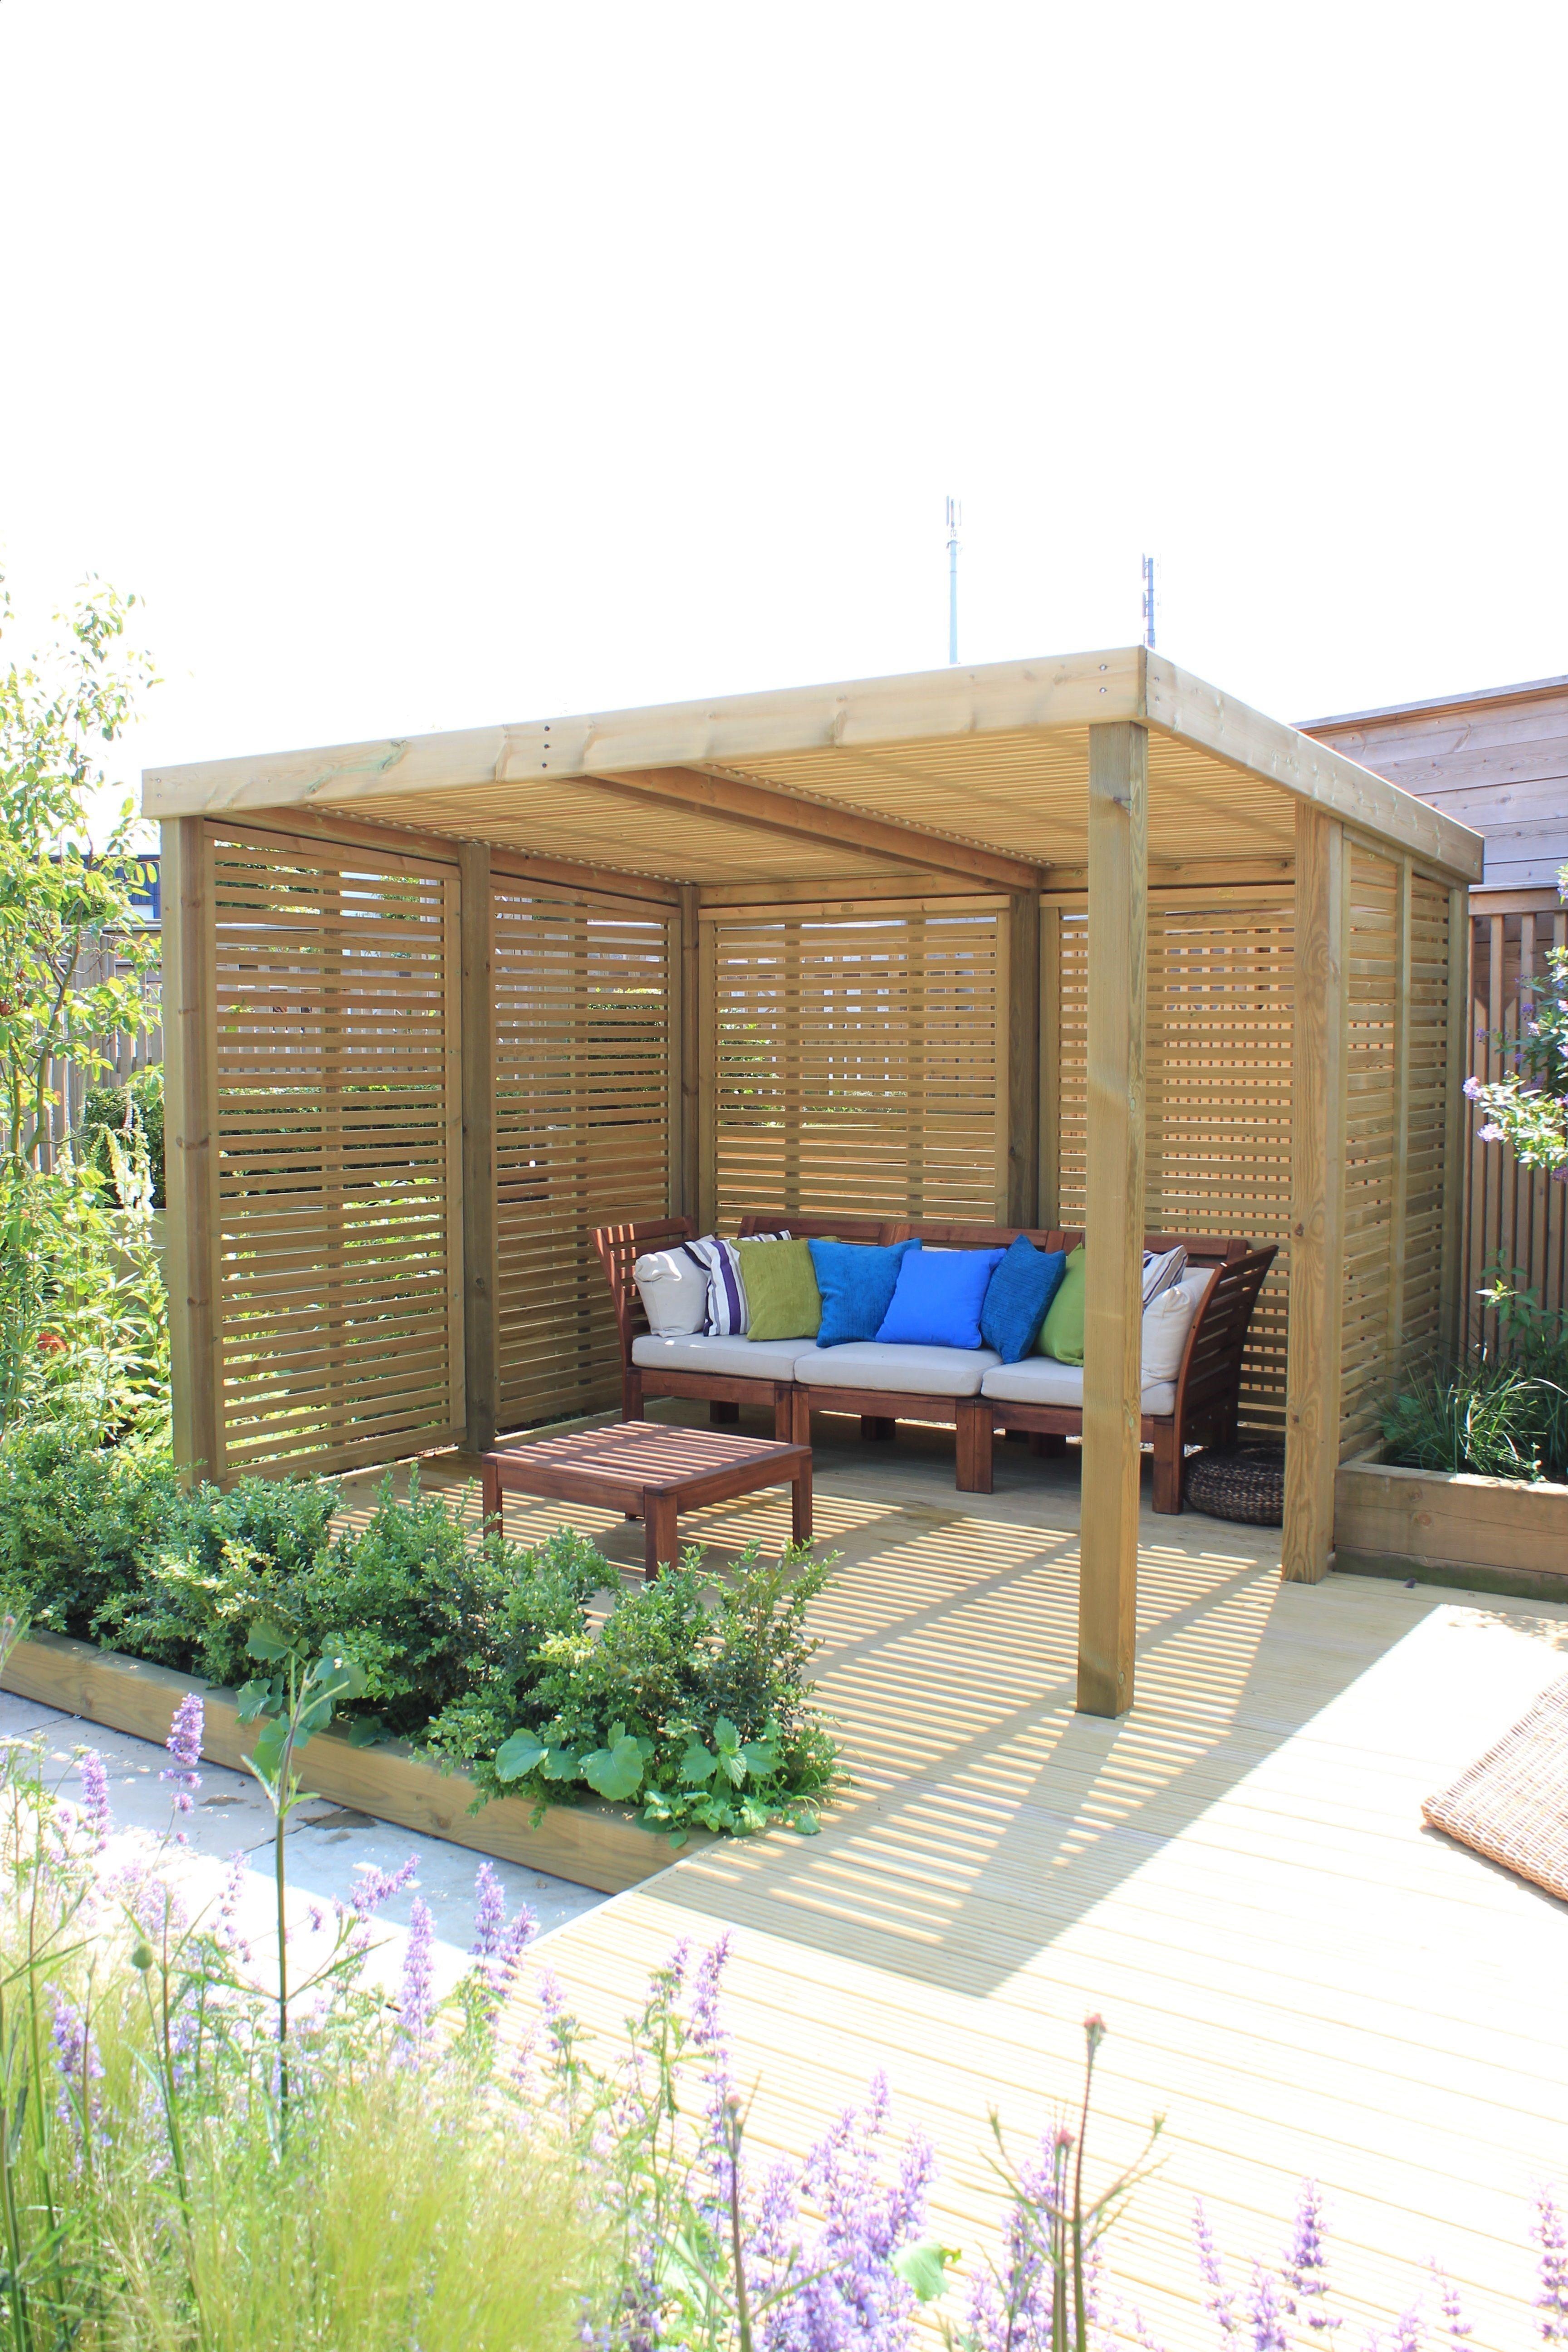 Shed Diy - A Contemporary Garden Shelter From Jacksons ... destiné Abri De Jardin Contemporain